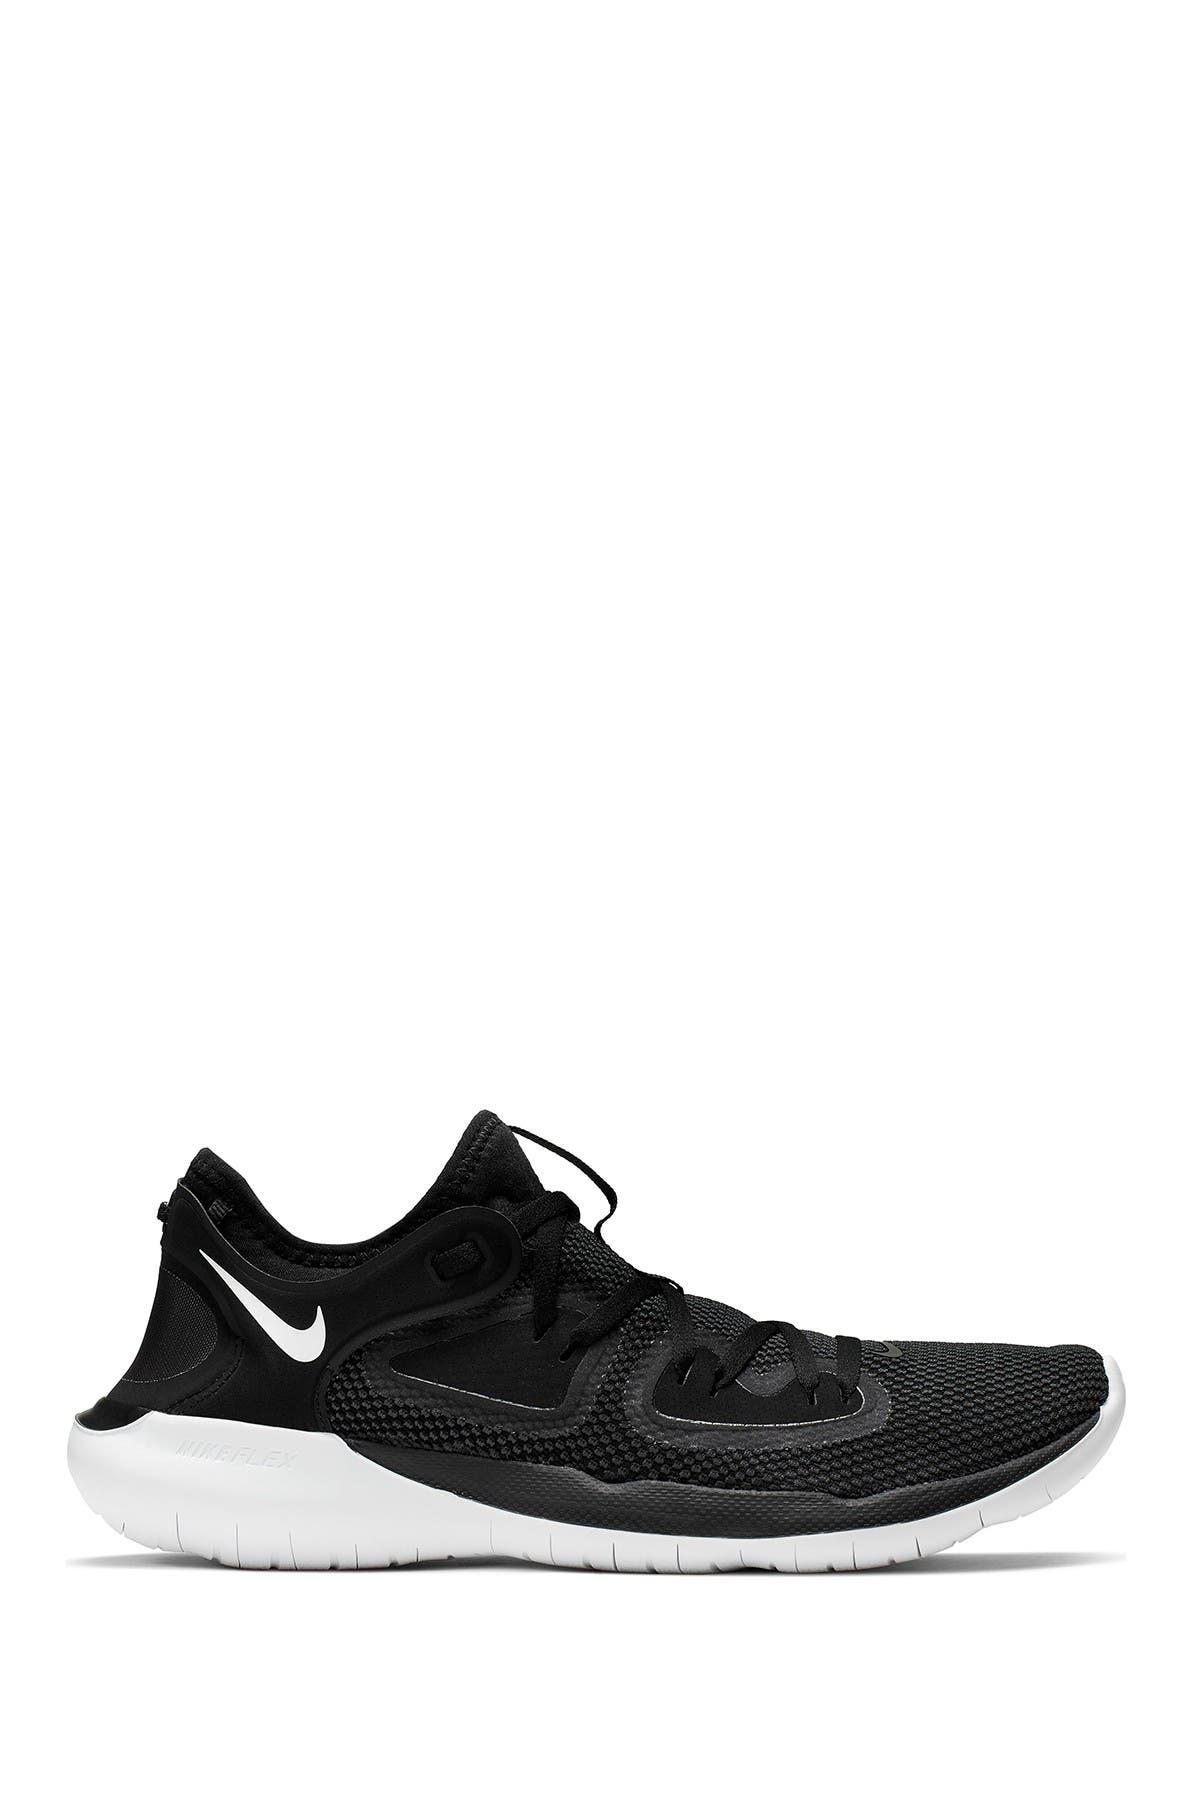 Nike   Flex RN 2019 Perforated Sneaker